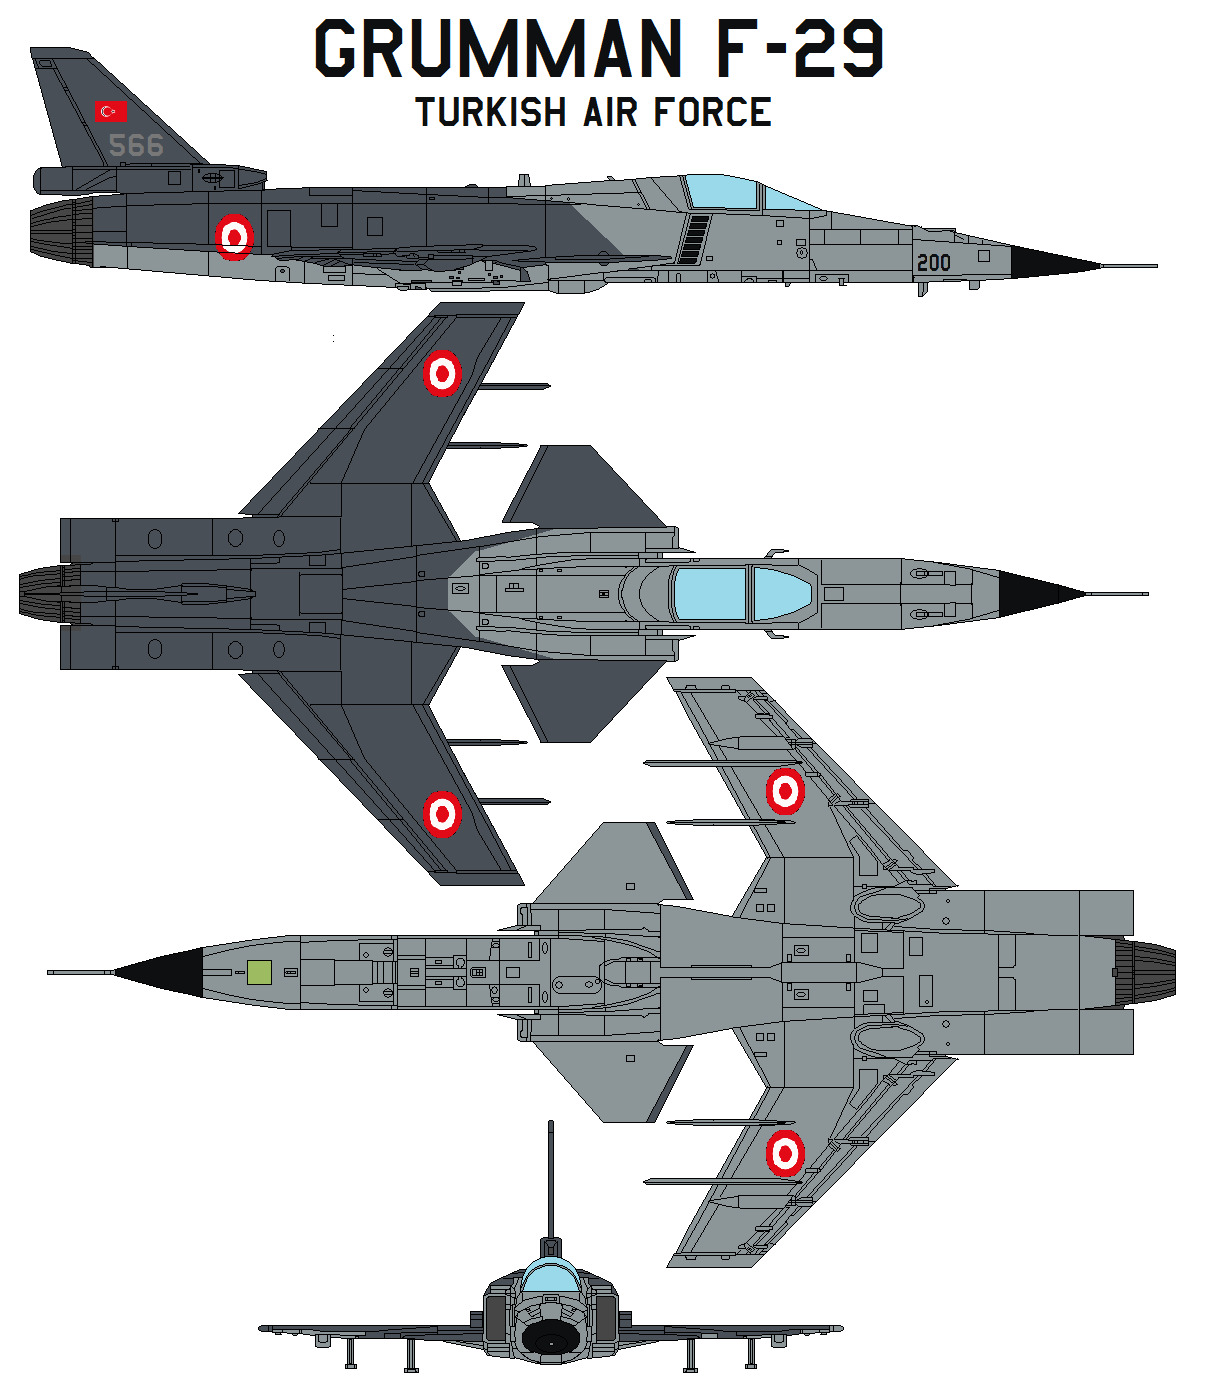 Grumman f-29  Turkish Air Force by bagera3005